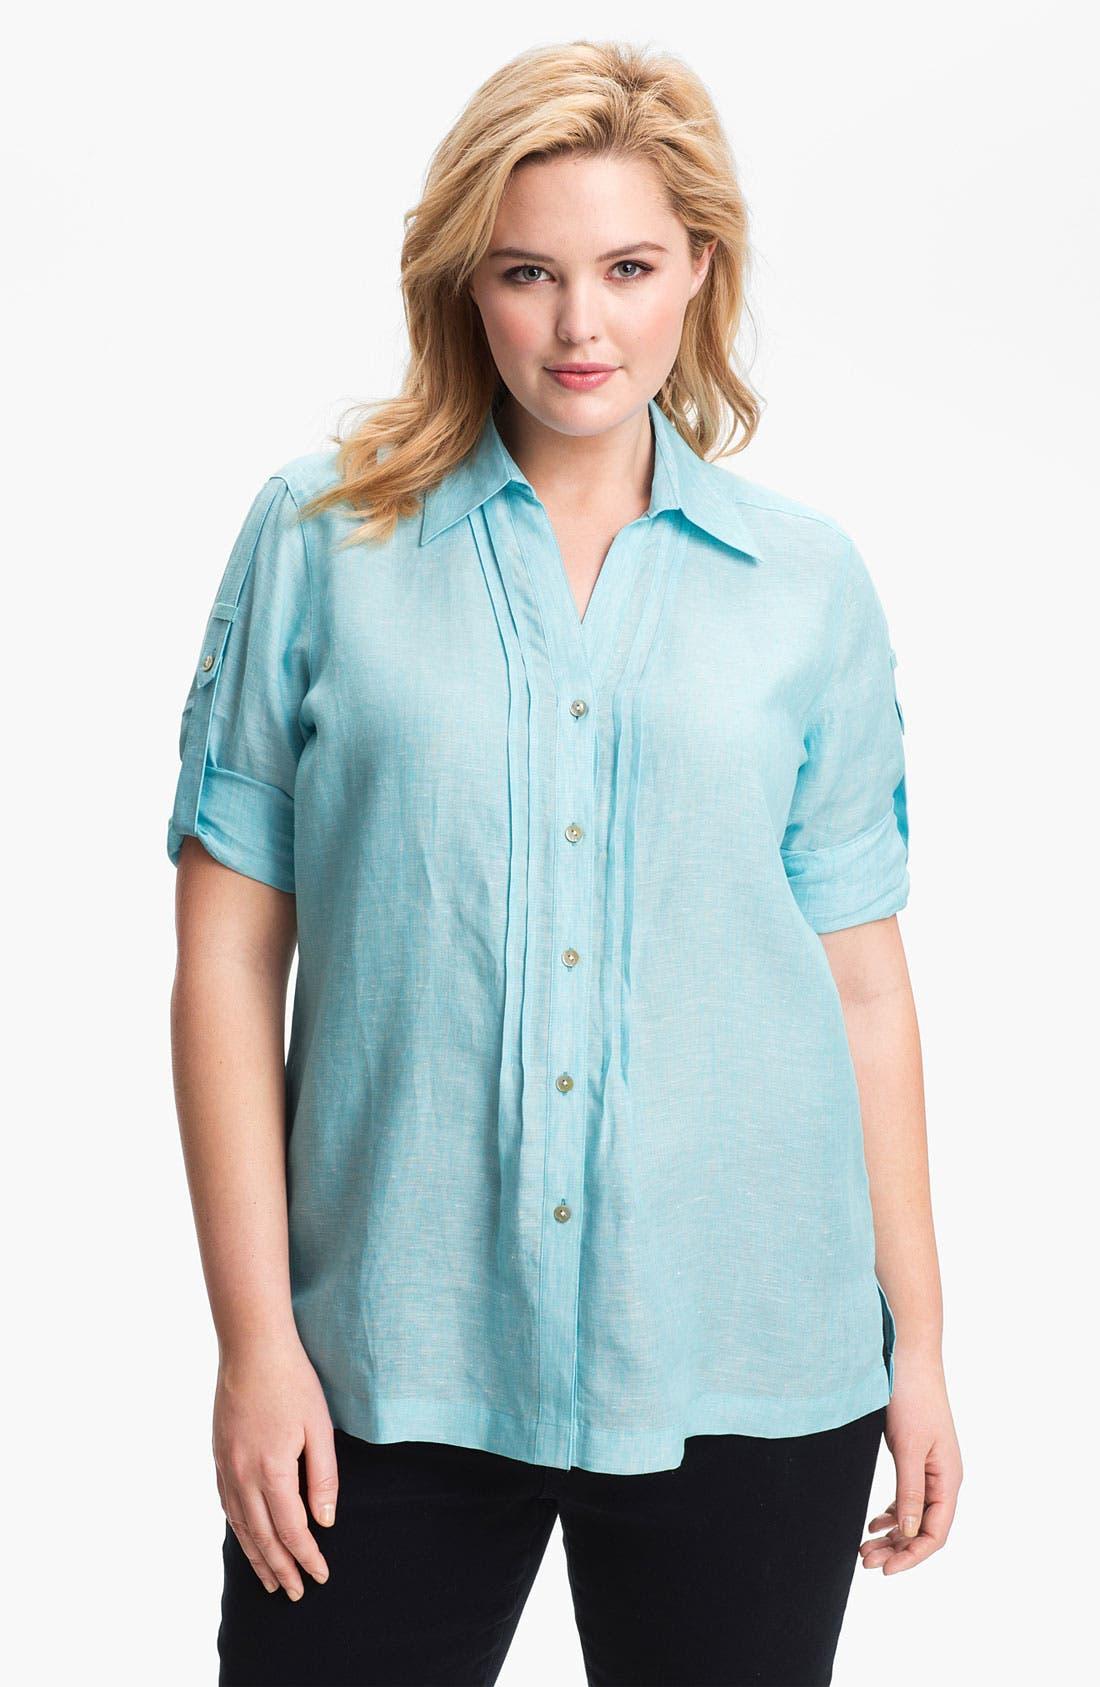 Alternate Image 1 Selected - Foxcroft Chambray Linen Shirt (Plus Size)